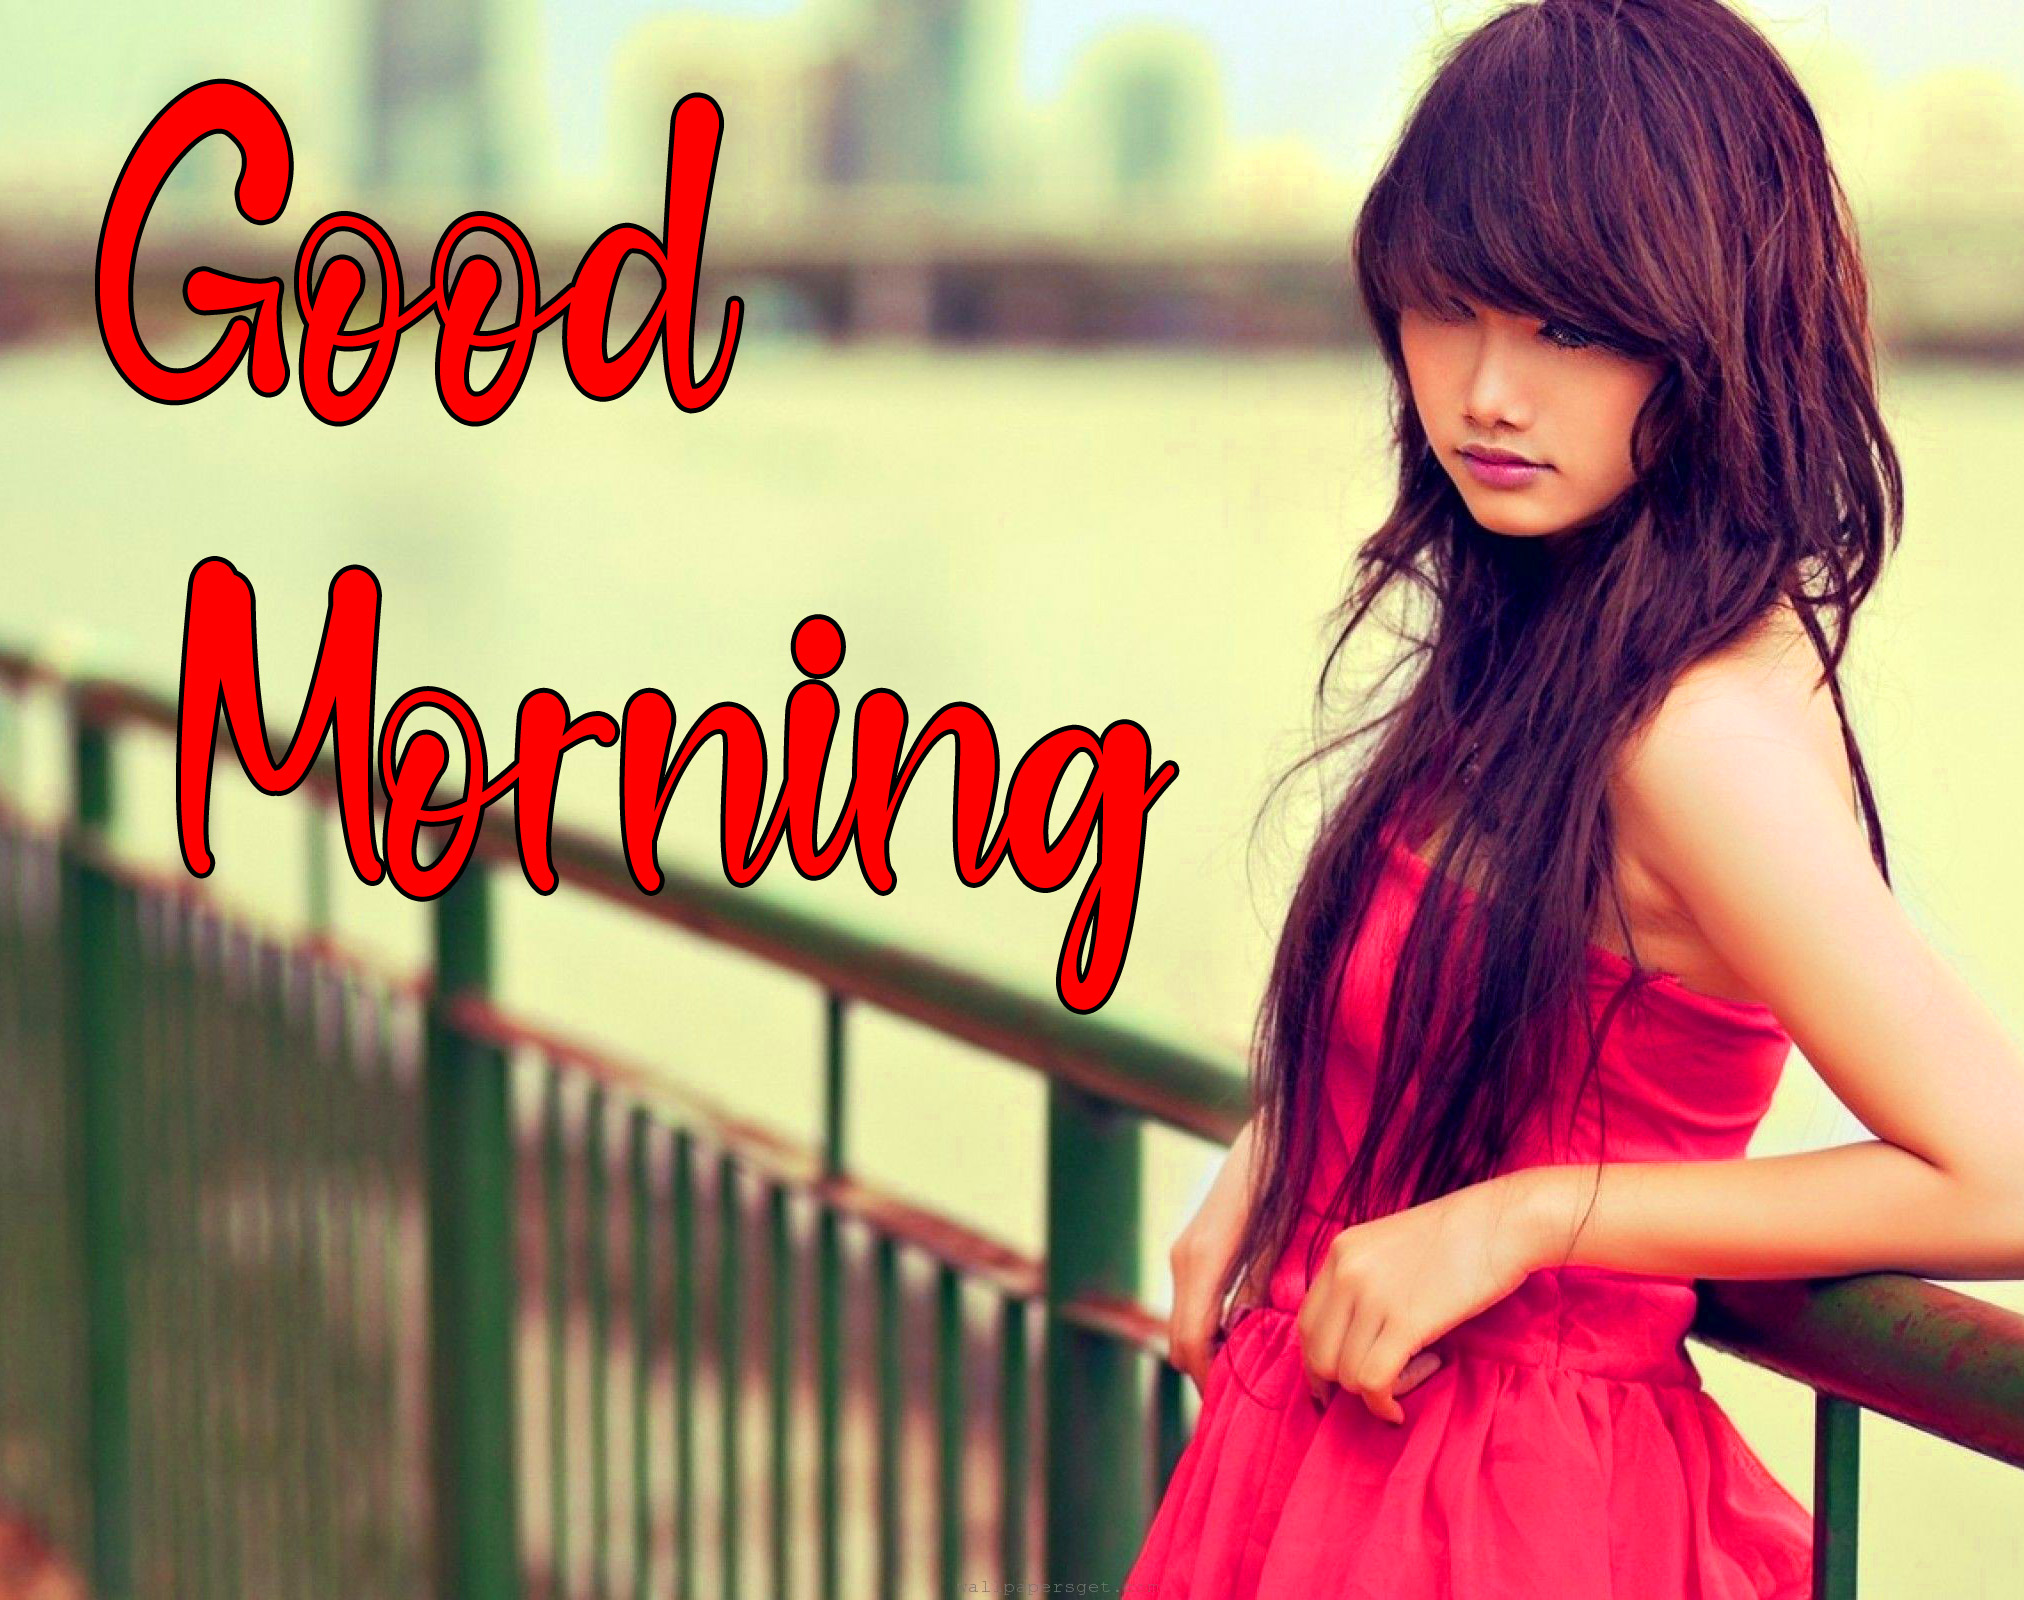 good morning Images for girls 15